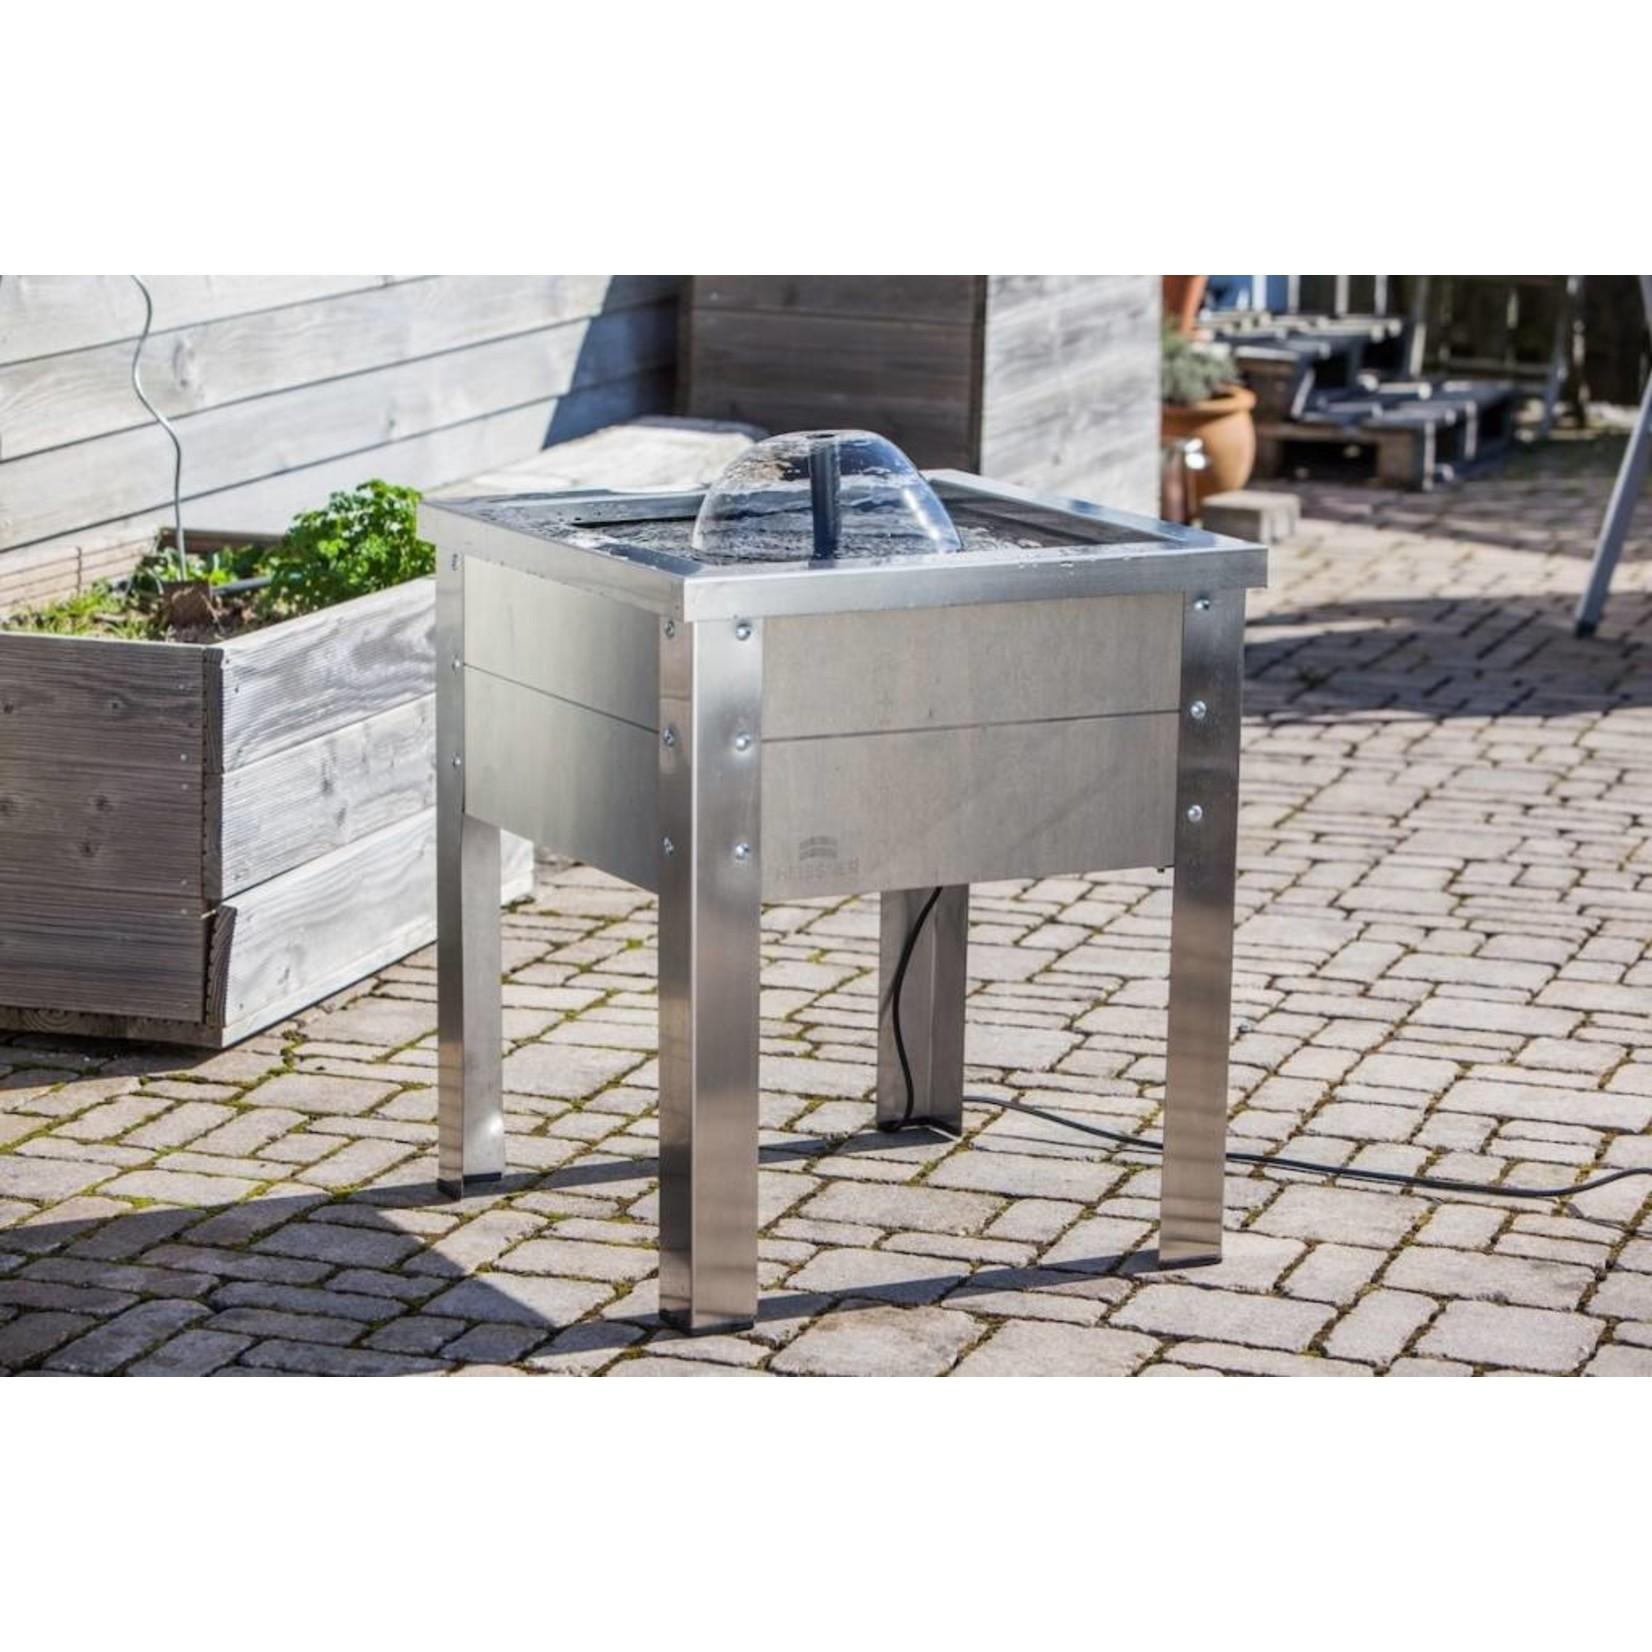 Heissner Terras fontein hout/RVS grijs